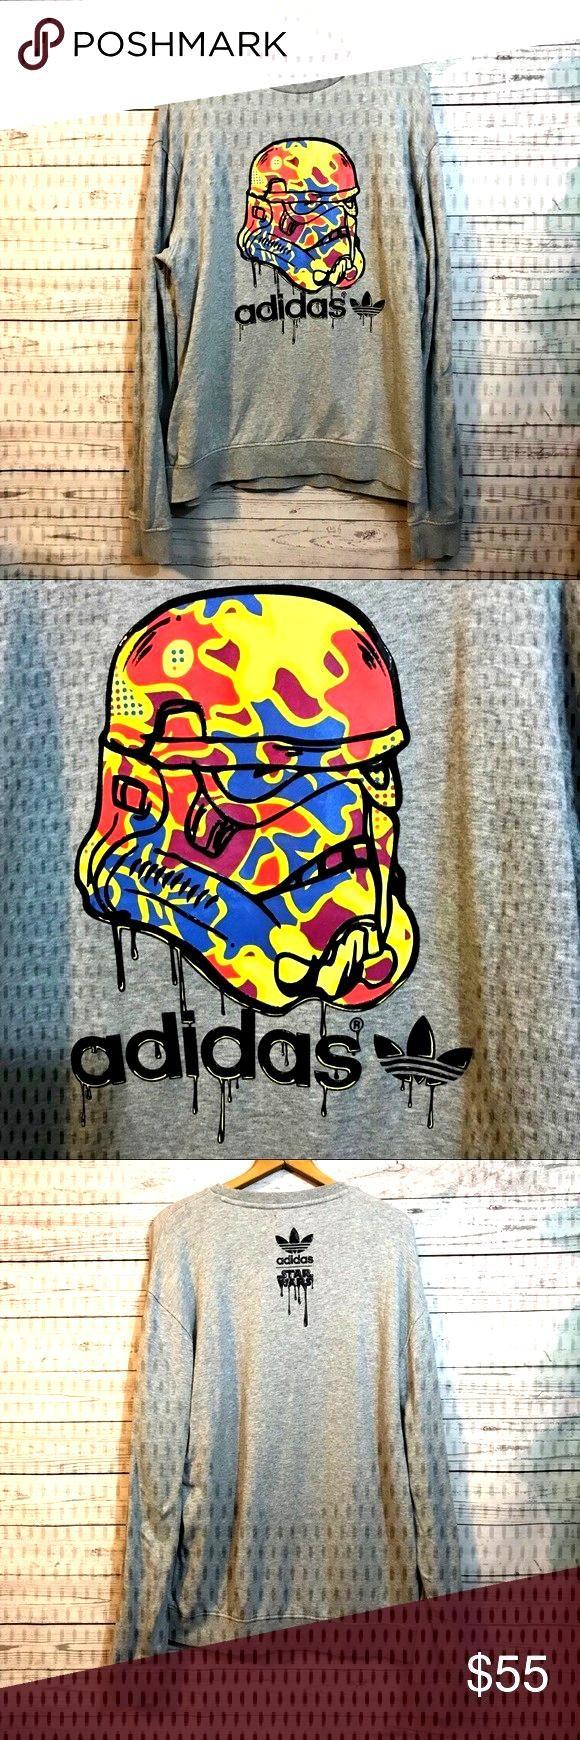 Lightweight Sweatshirt Jackets Trefoil Adidas Length Coats Chest Shirt Vader Darth Like Size New Box Sweatshirts Adidas Trefoil Sweatshirt Shirt [ 1740 x 580 Pixel ]